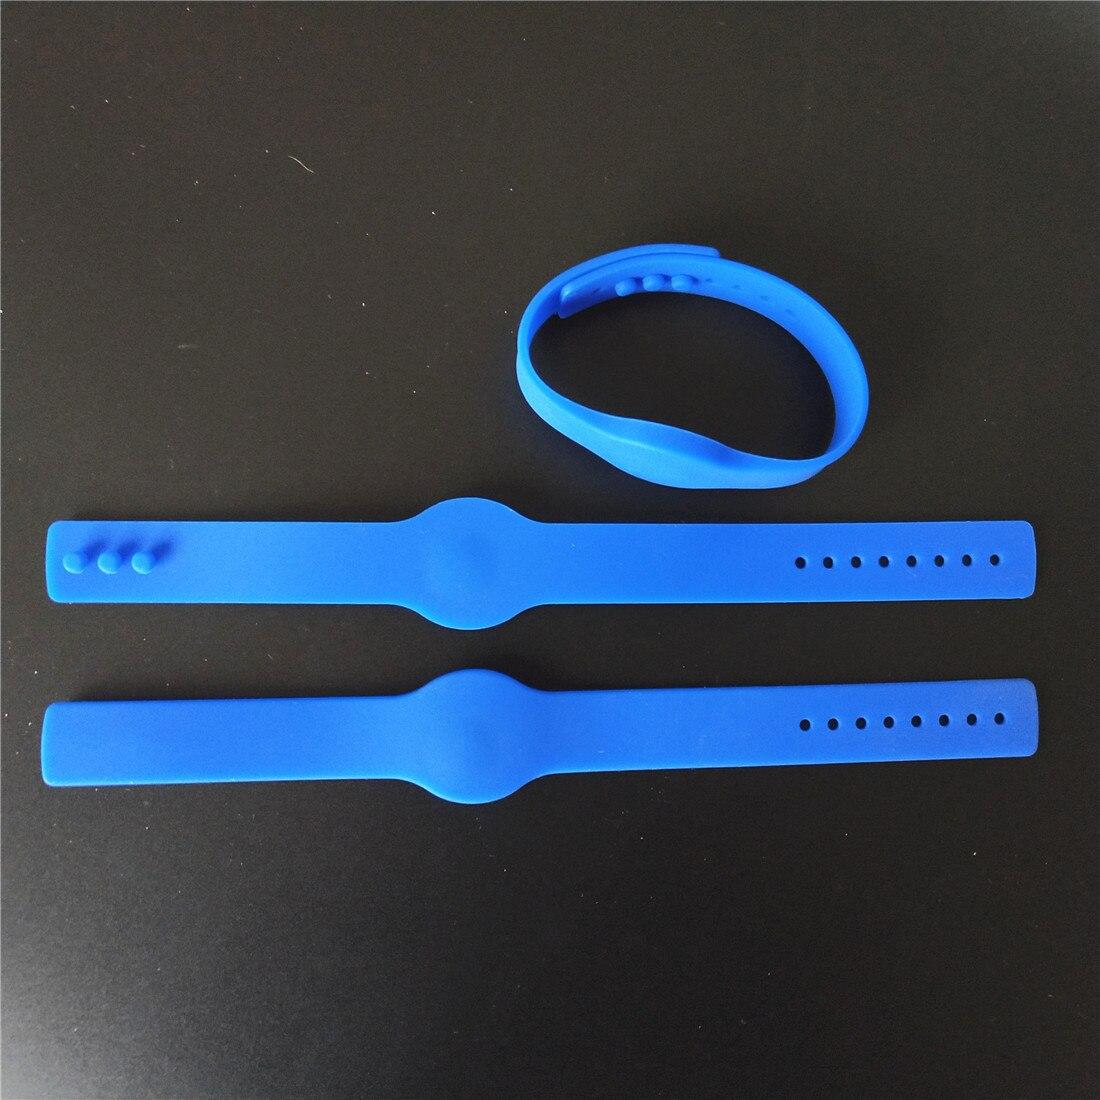 125KHZ EM4100 TK4100 RFID Wristband Blue Waterproof Silicone Bracelet Pack of 5Pcs 65mm